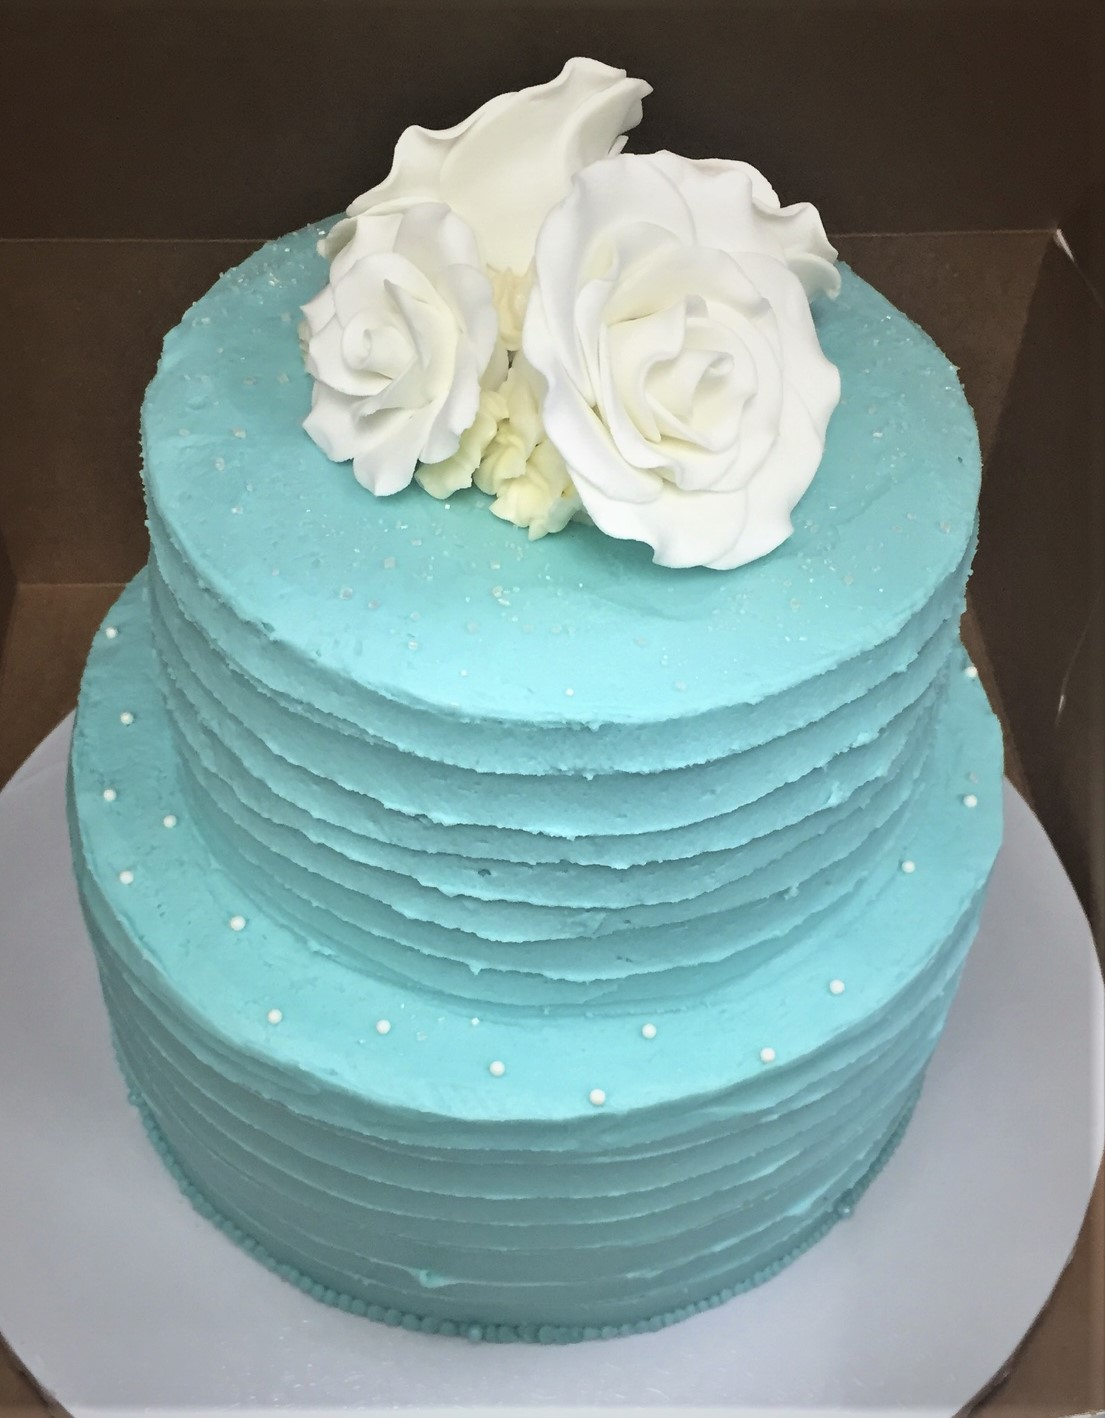 Gateaux Bakery & Cafe Beautiful Teal Cake 3.9.19.jpeg